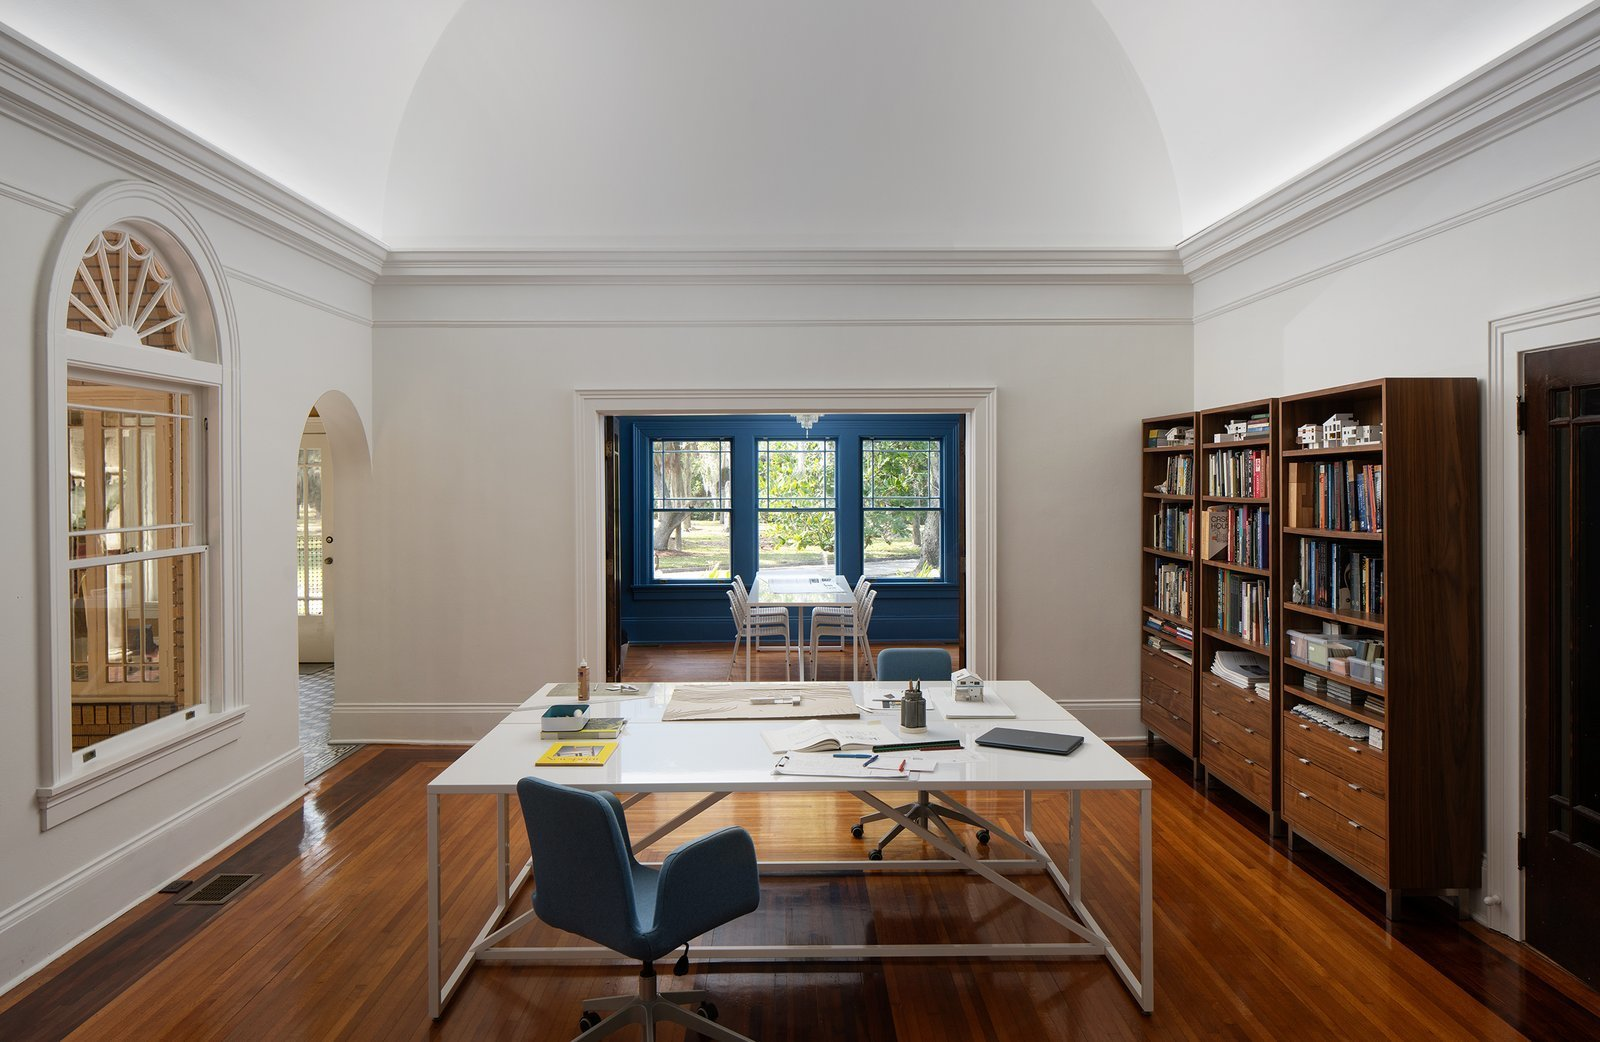 Dundee House study